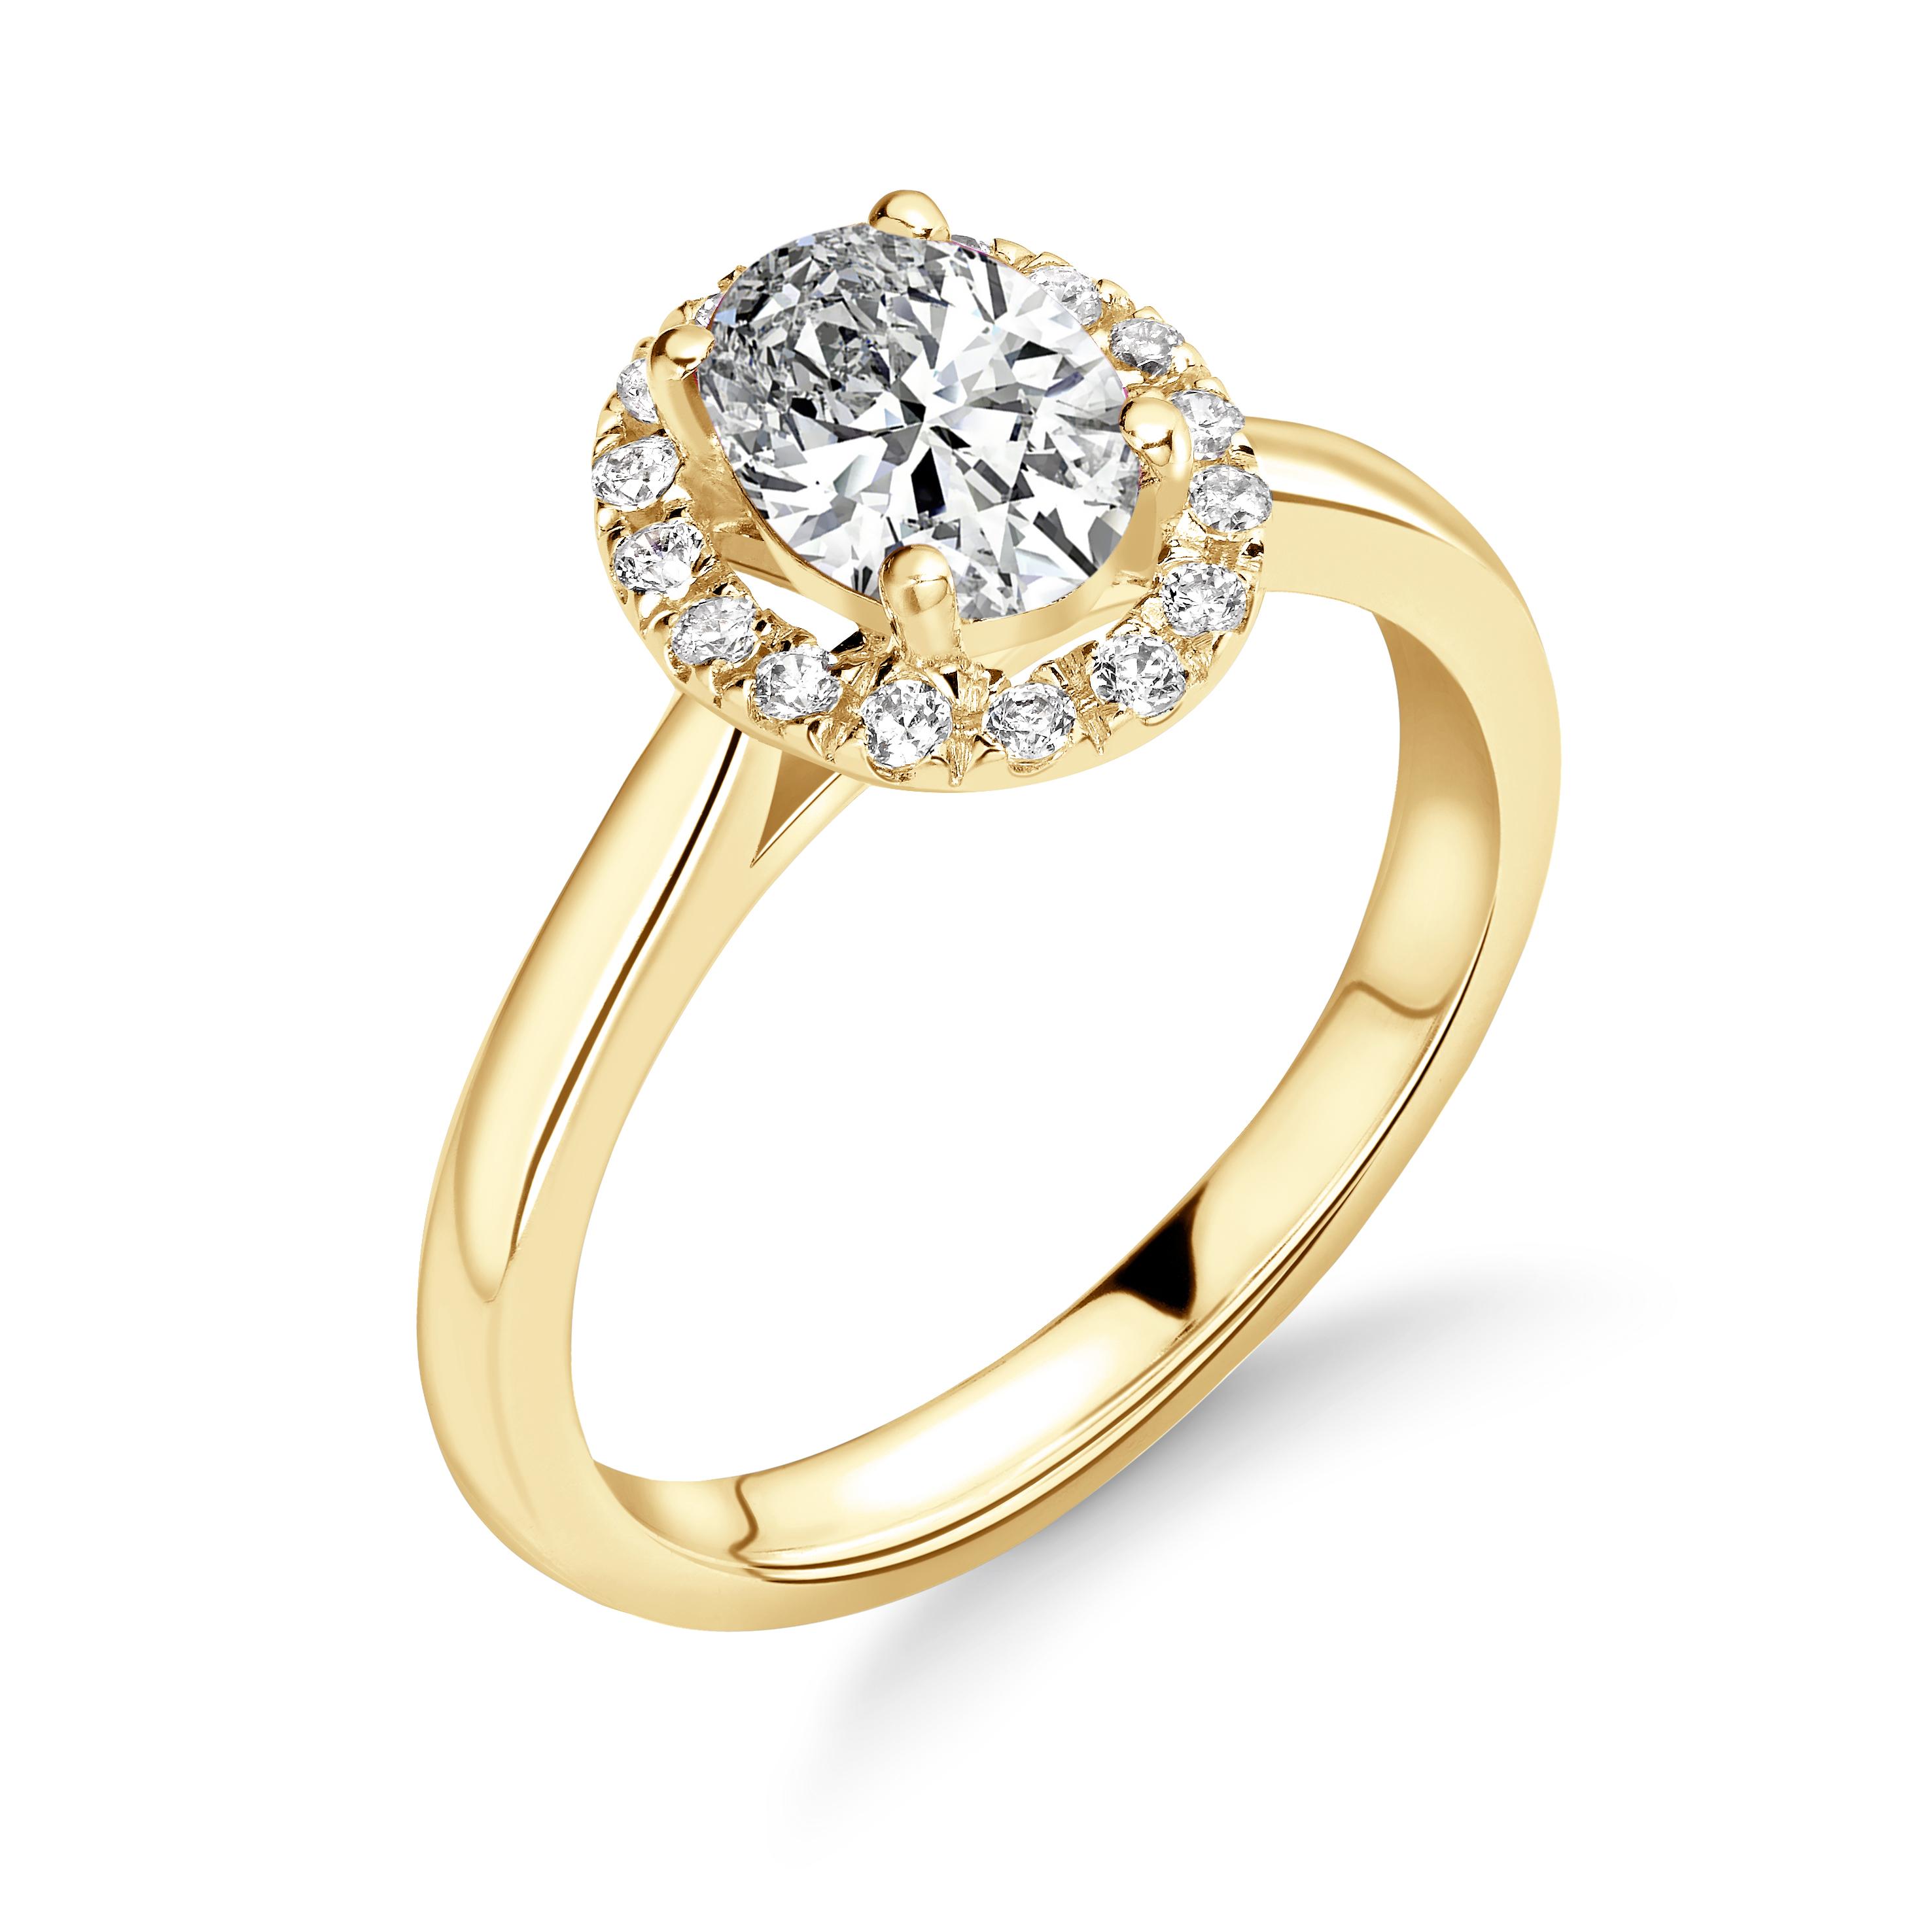 4 Prong Setting Oval Shape Circle of Diamond Halo Diamond Engagement Rings